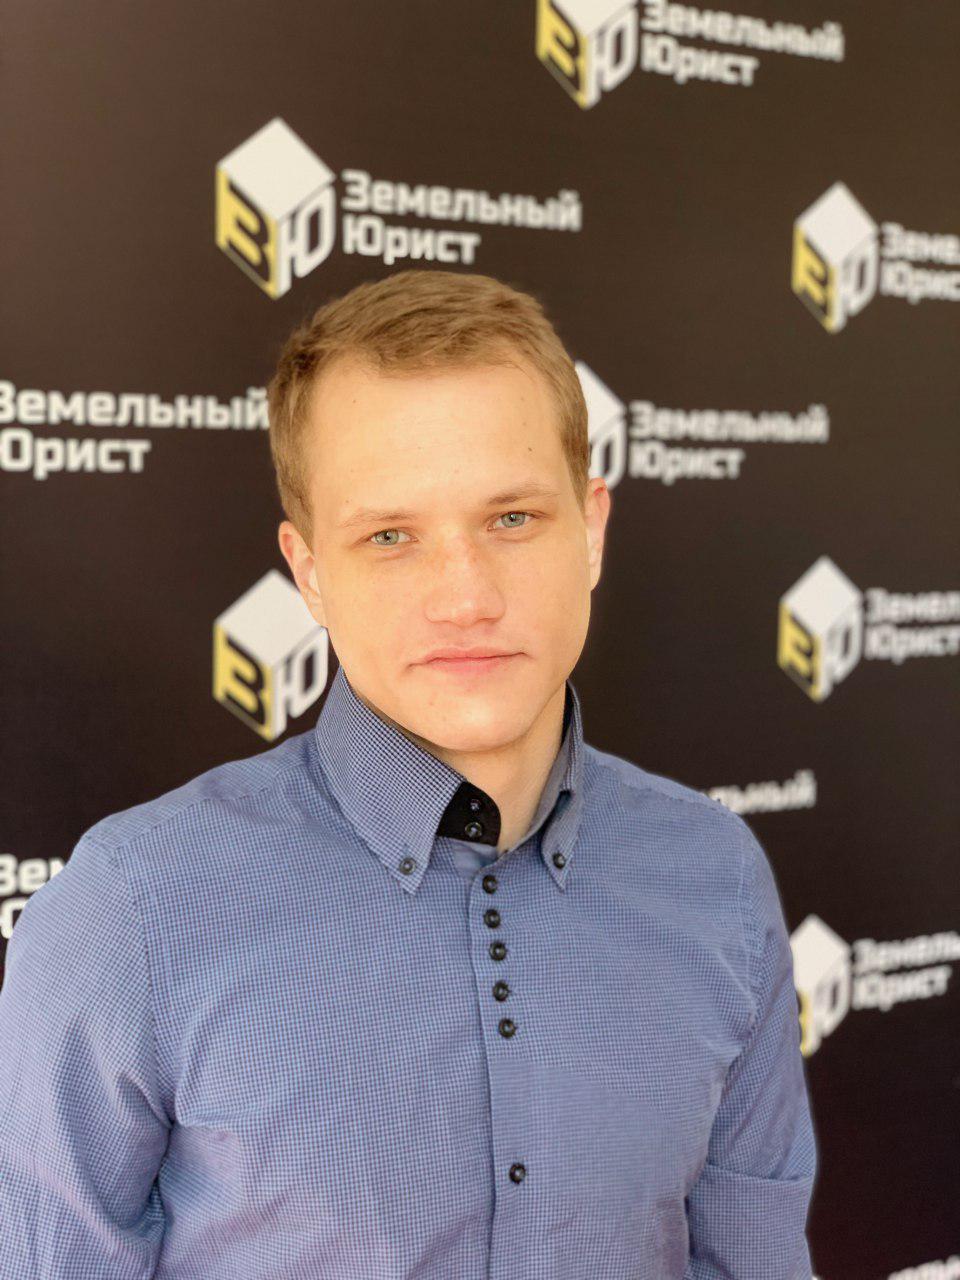 Есаков Евгений Дмитриевич